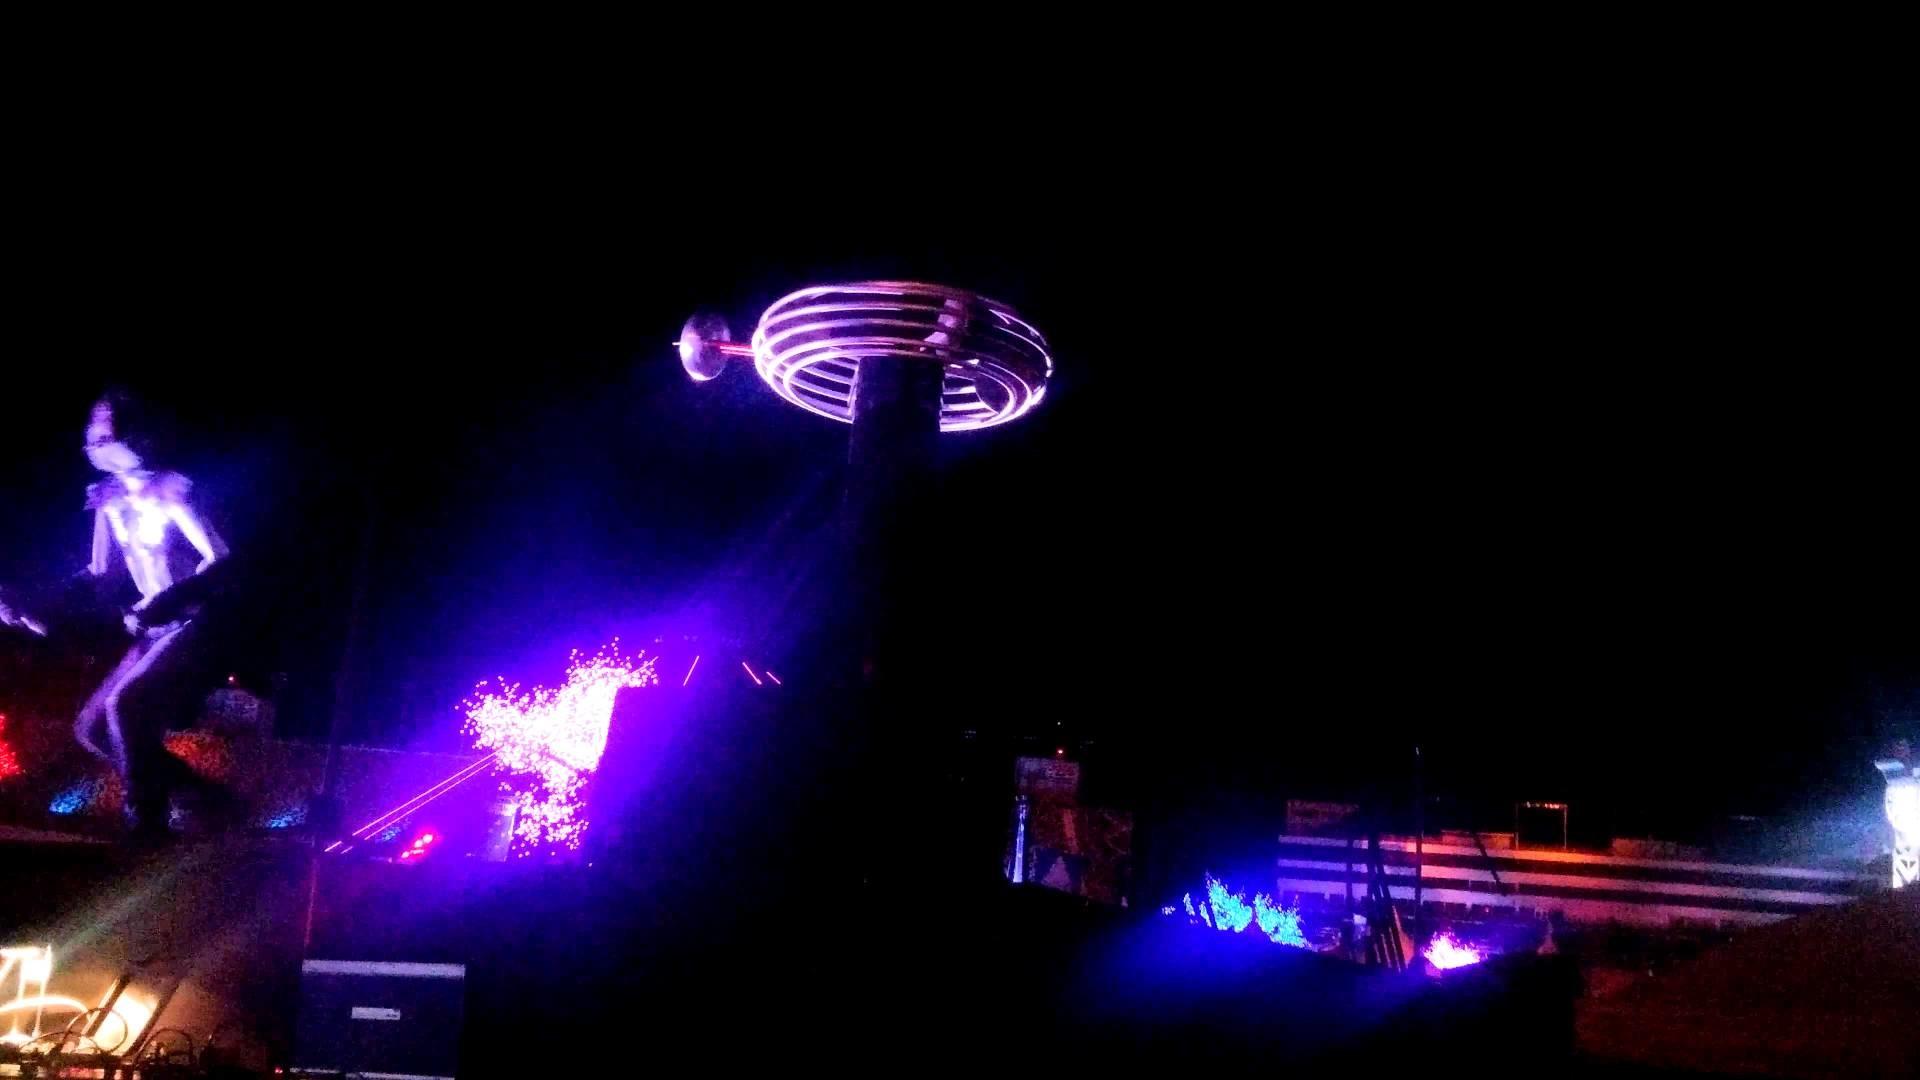 Edc Las Vegas 2015 tesla coil dancer 4k